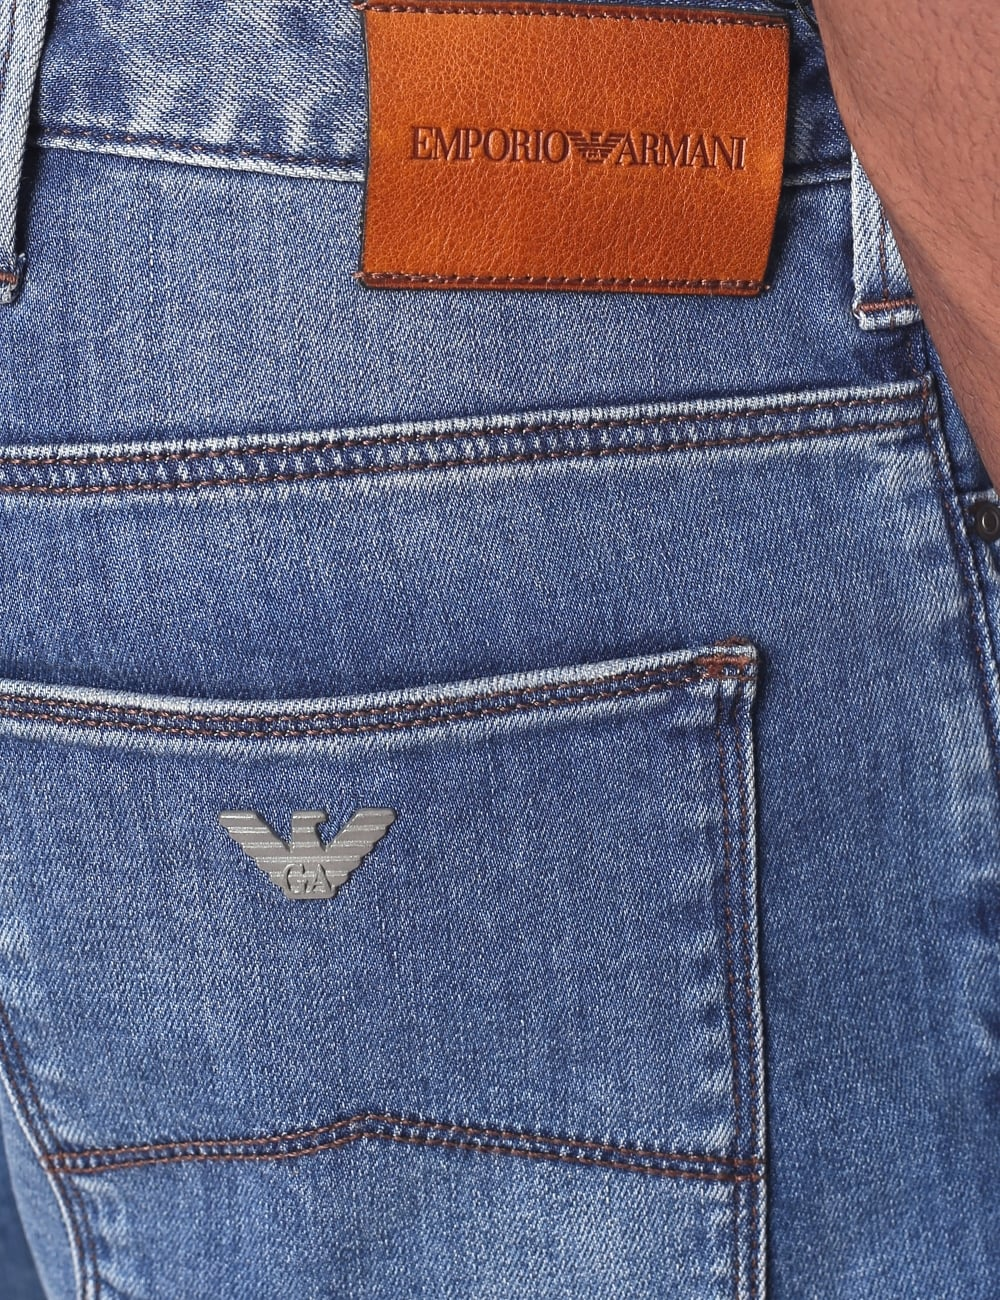 aa449000d Emporio Armani Men's Jean